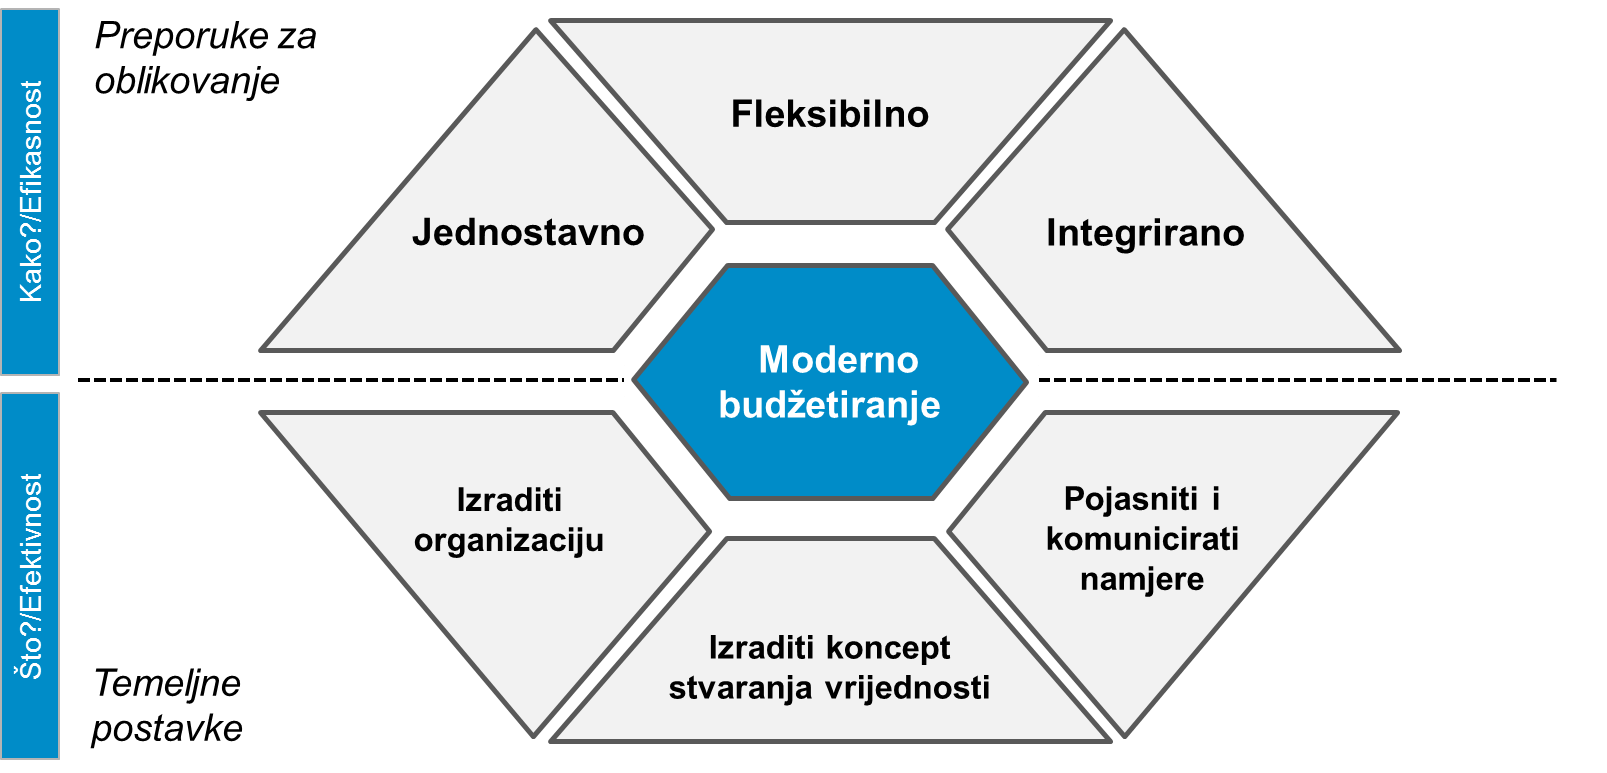 [CAP - Controlling Advanced Program] Moderno budžetiranje